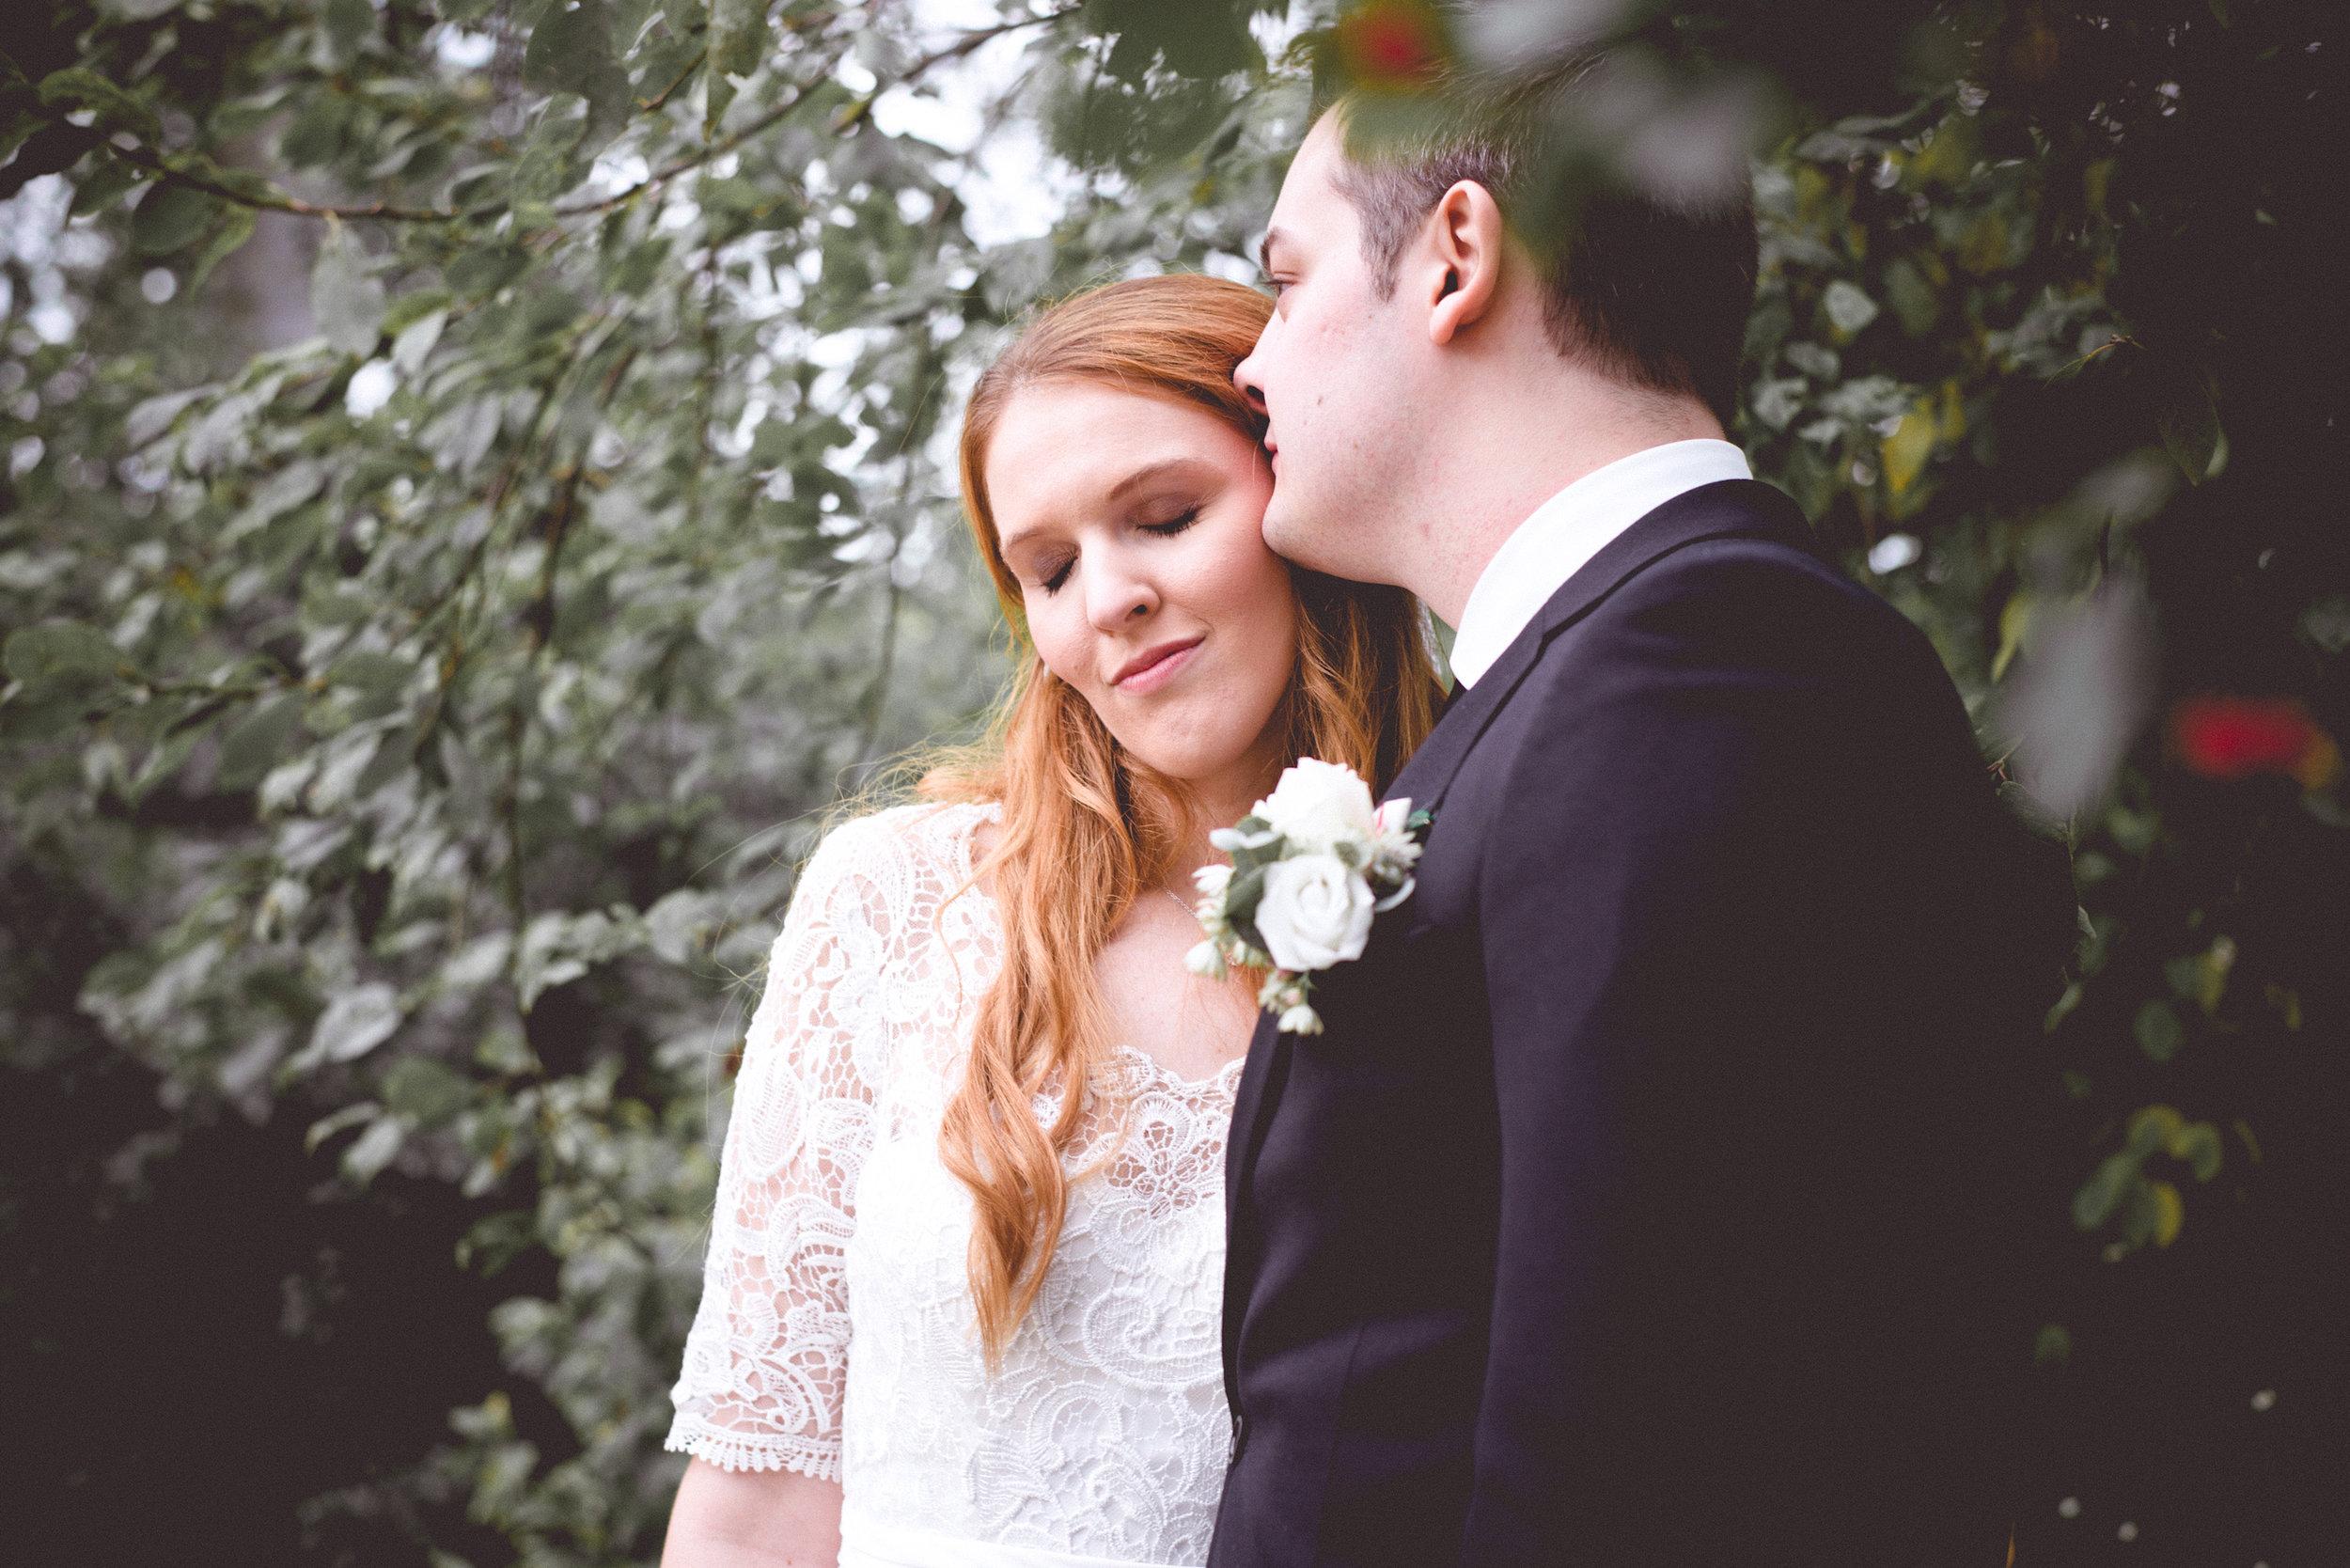 York Region Ontario Wedding Photographer - Bride + Groom-7.jpg